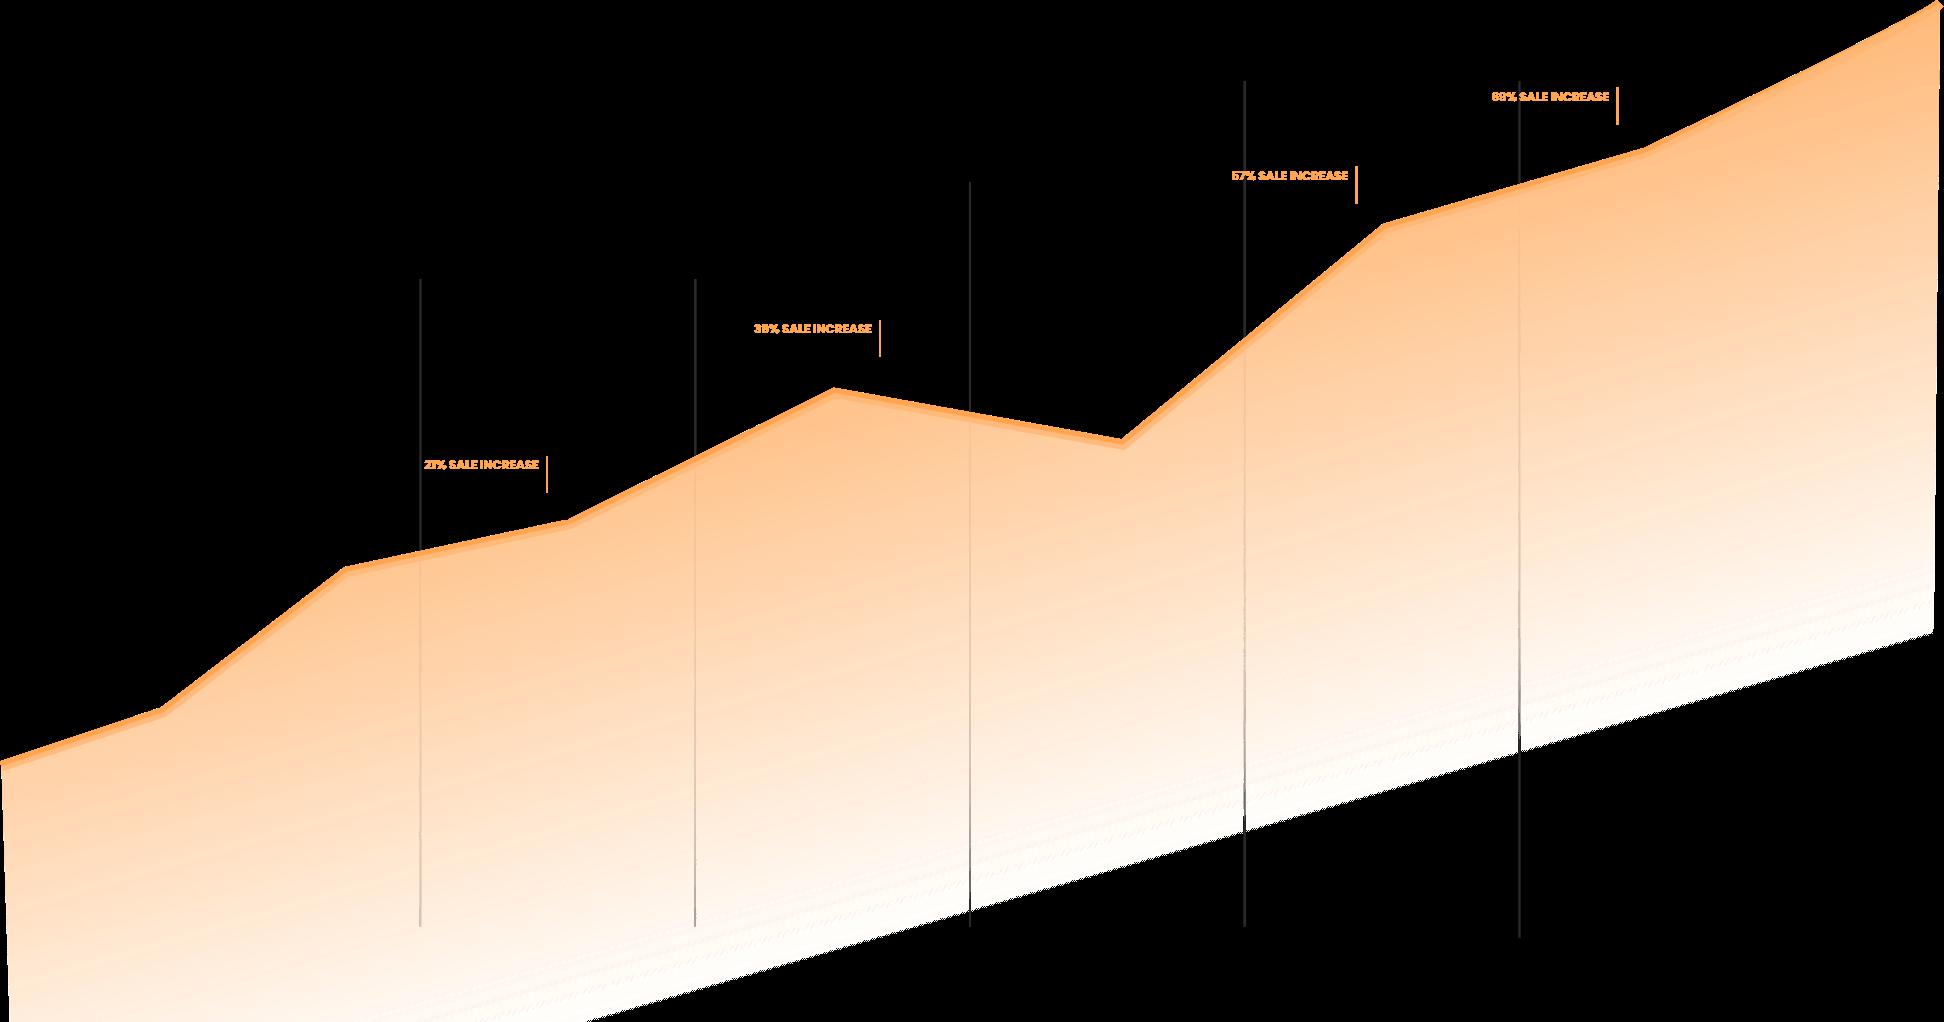 Graph of Sale